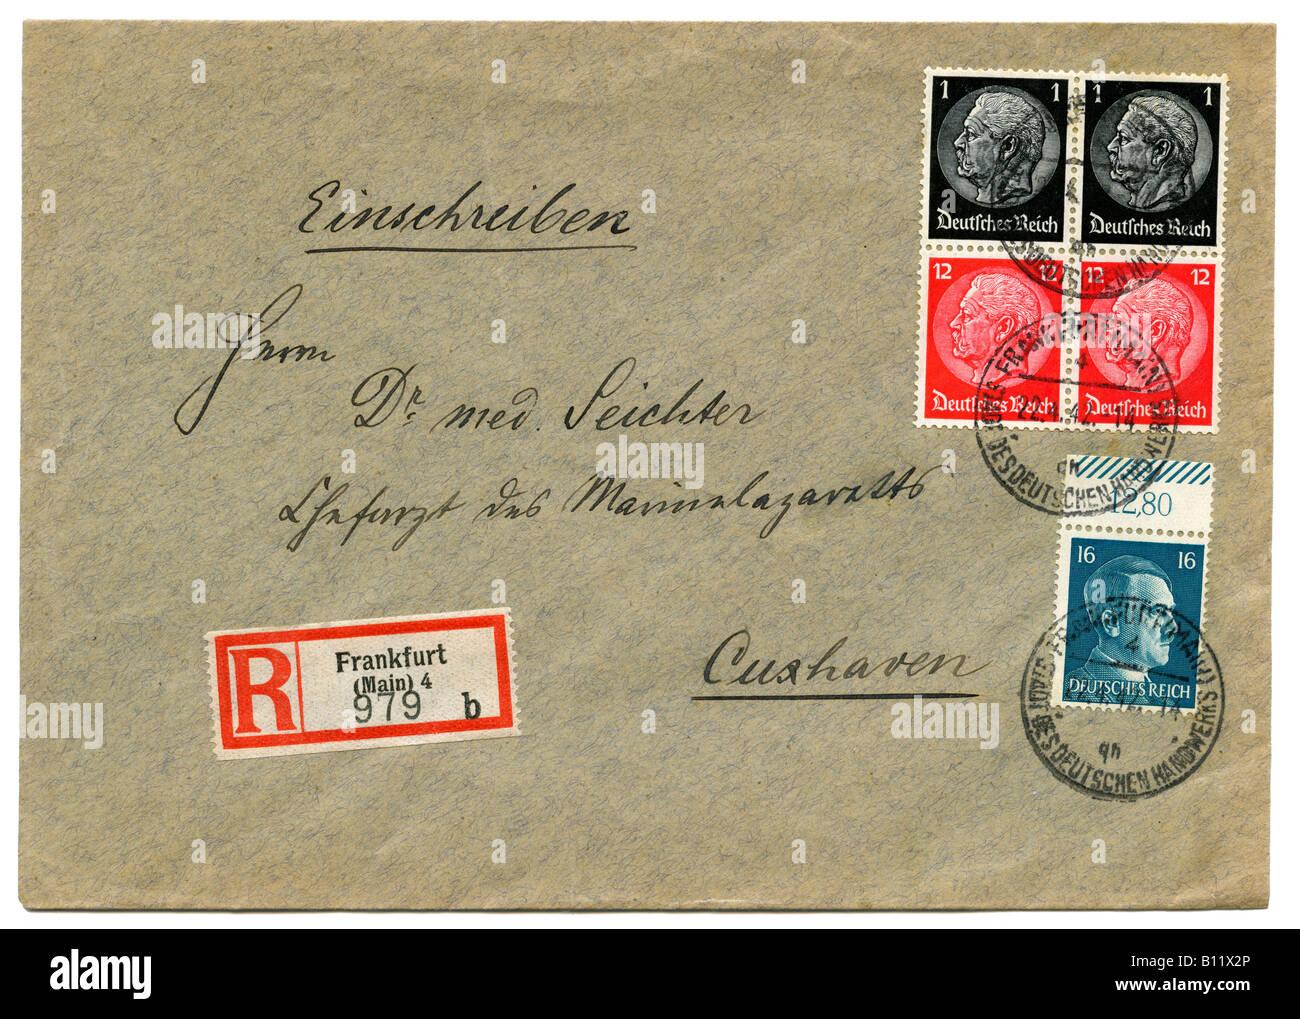 Germany Deutsches Reich Hindenburg stamps on Registered letter, postmarked Frankfurt am Main, 1942. - Stock Image